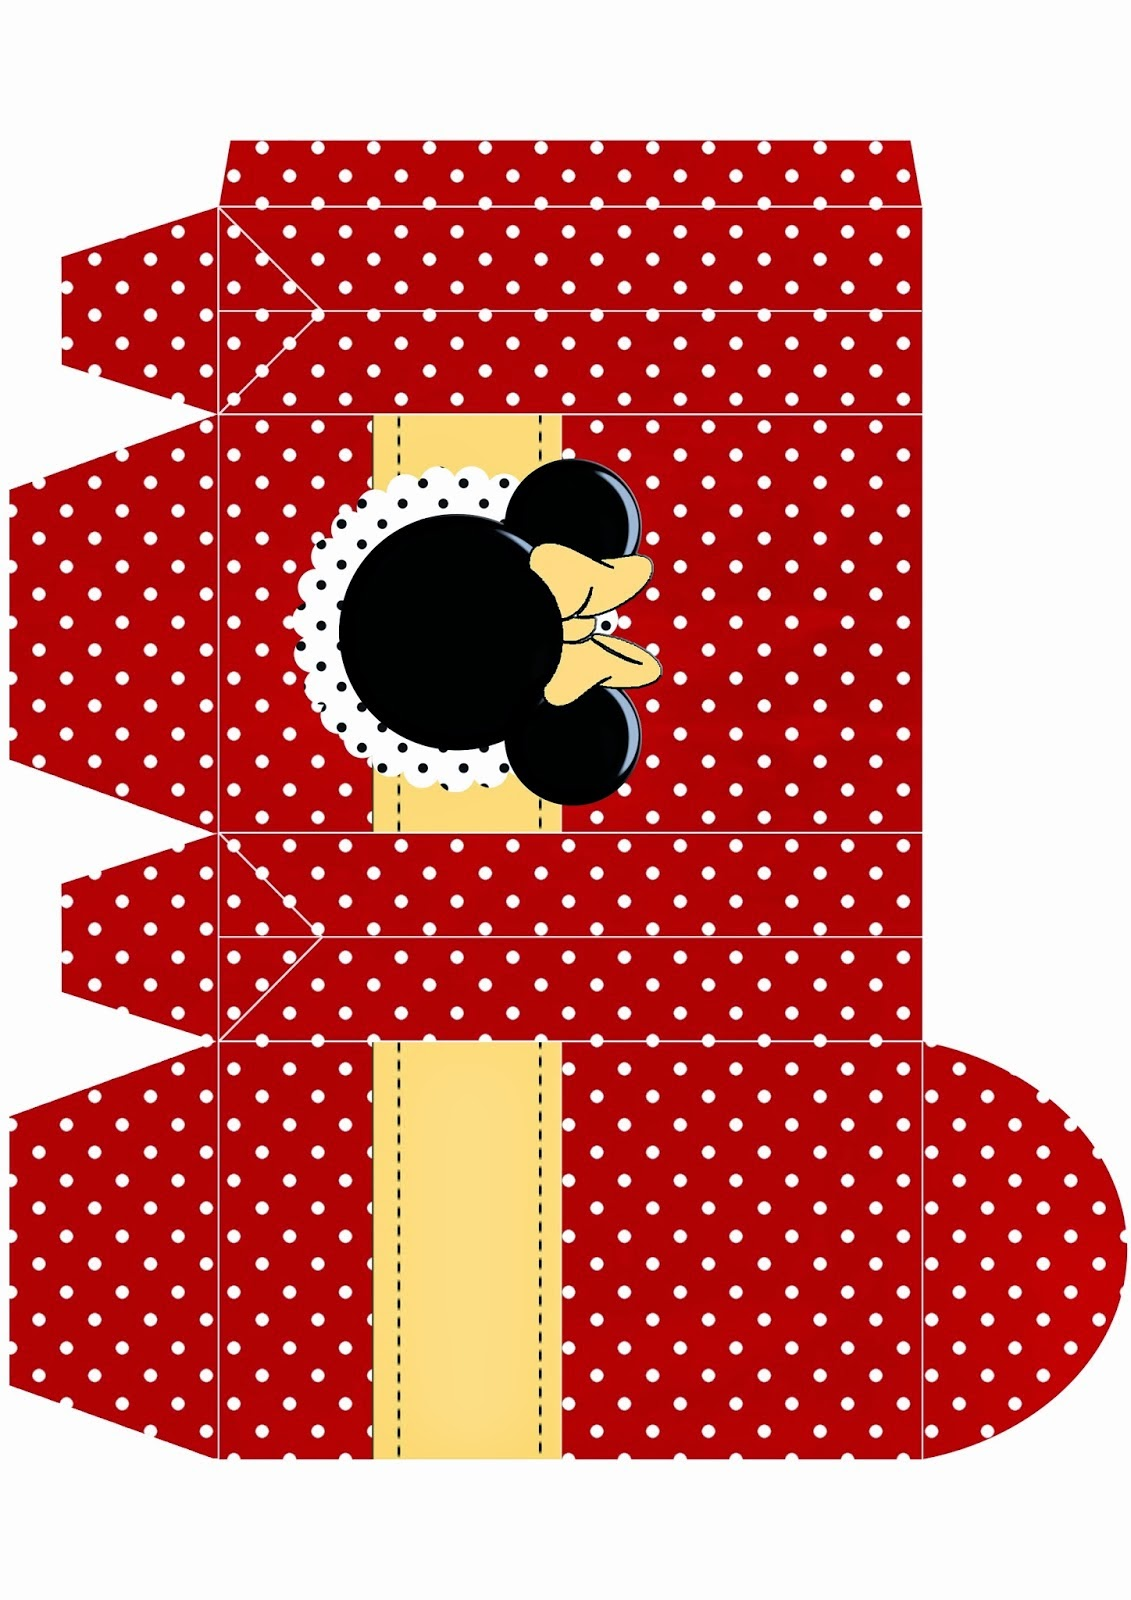 Uncategorized Free Minnie Mouse Printables funny red minnie mouse free printables is it for parties printable box